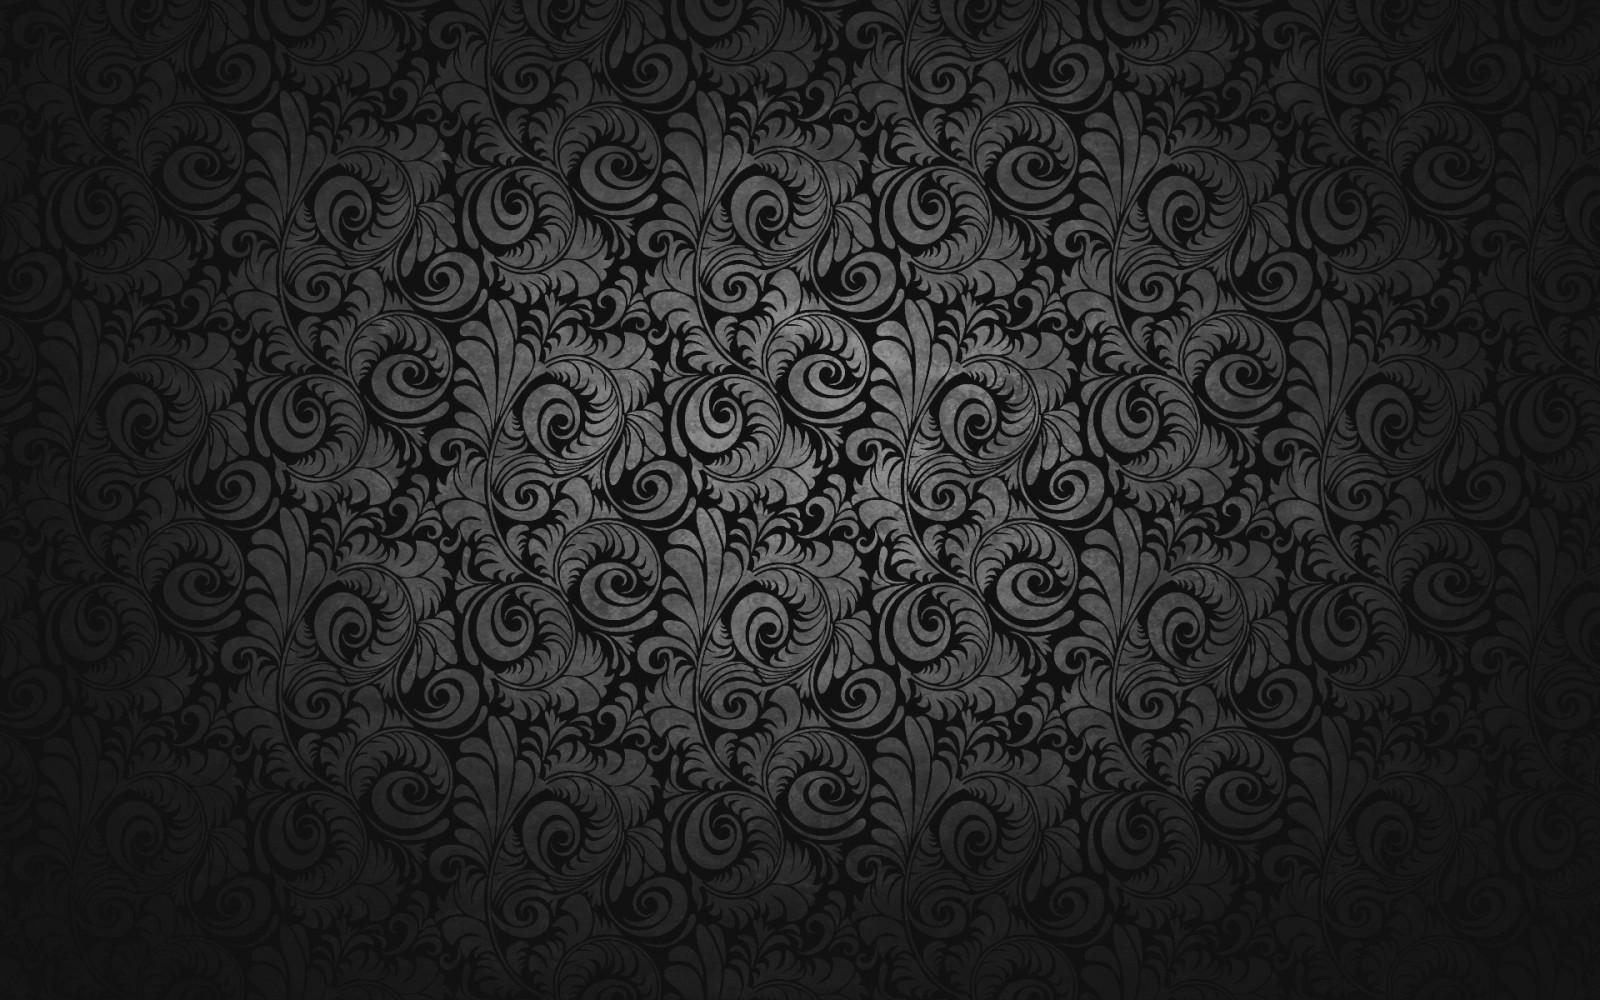 Wallpaper : satu warna, gelap, simetri, pola, tekstur ...